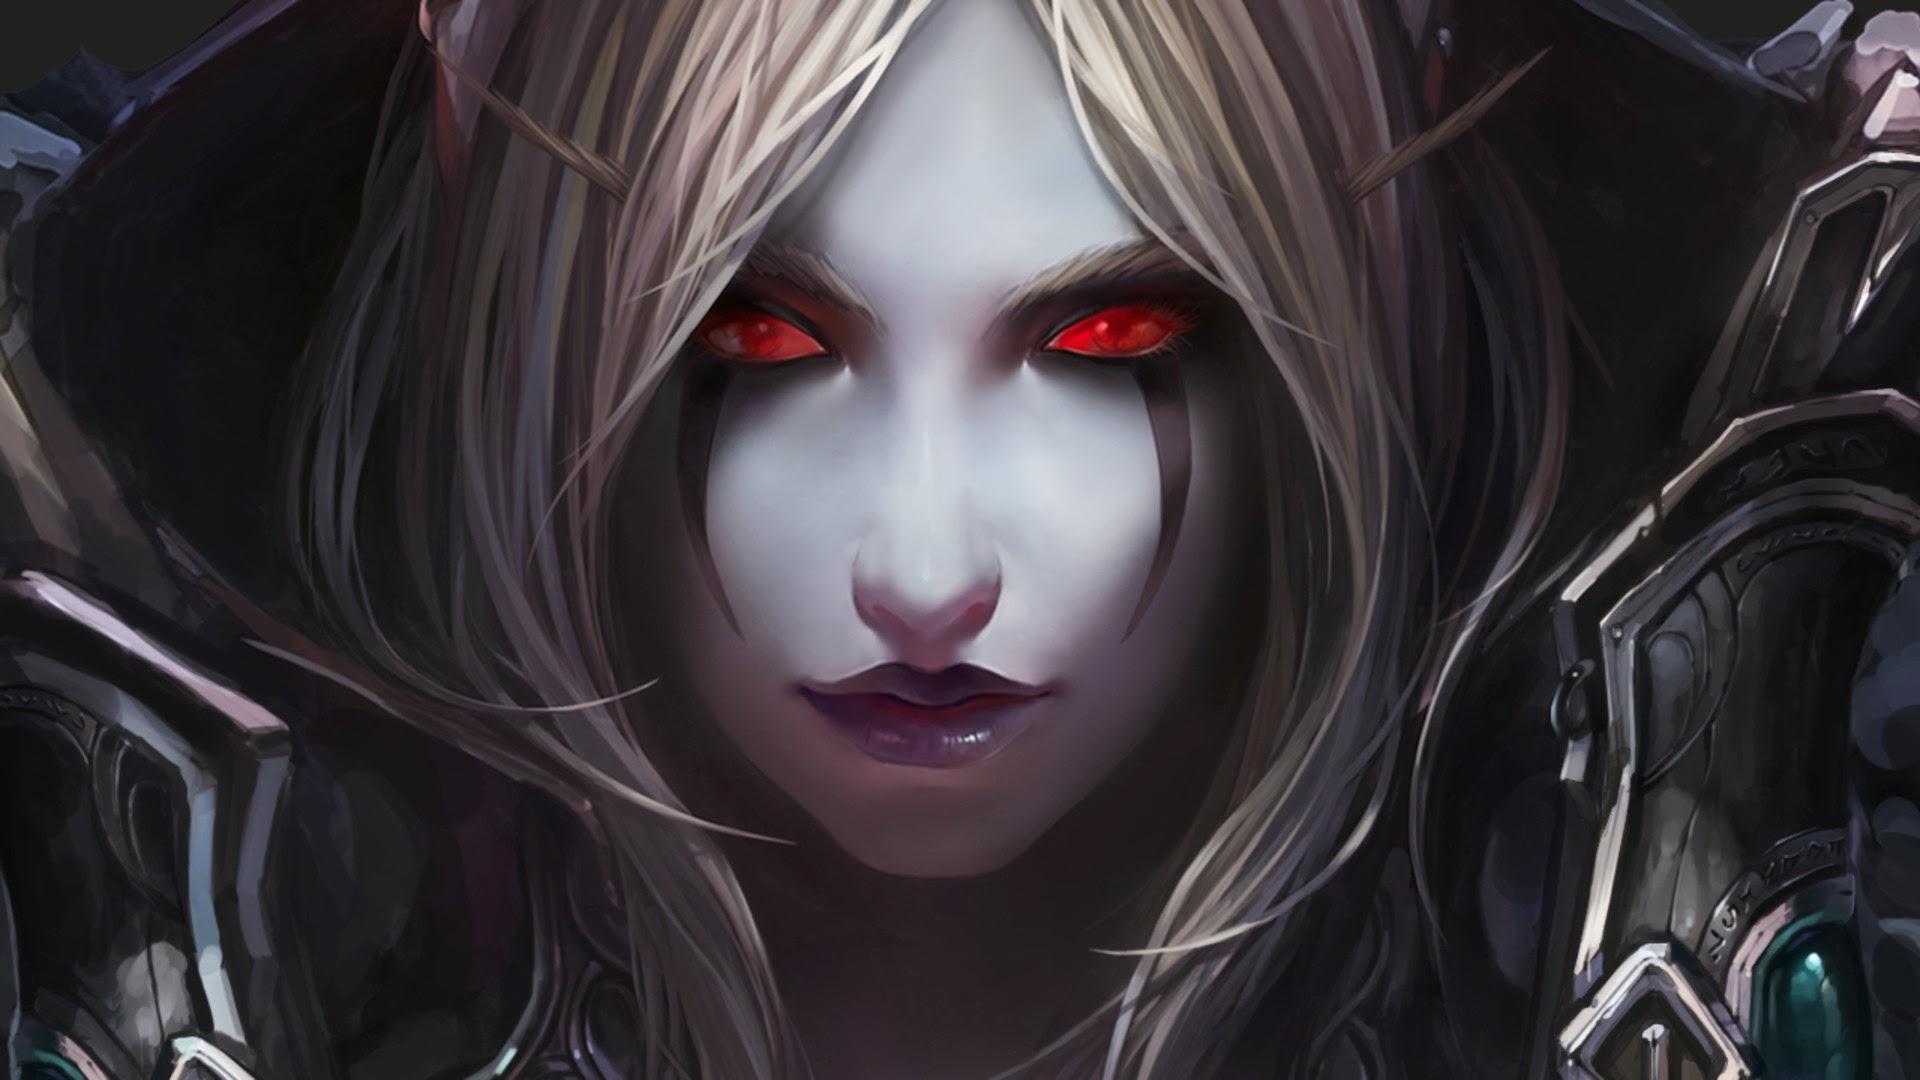 beautiful fantasy girl red eyes wallpaper hd fantasy 1920x1080 a694 1920x1080